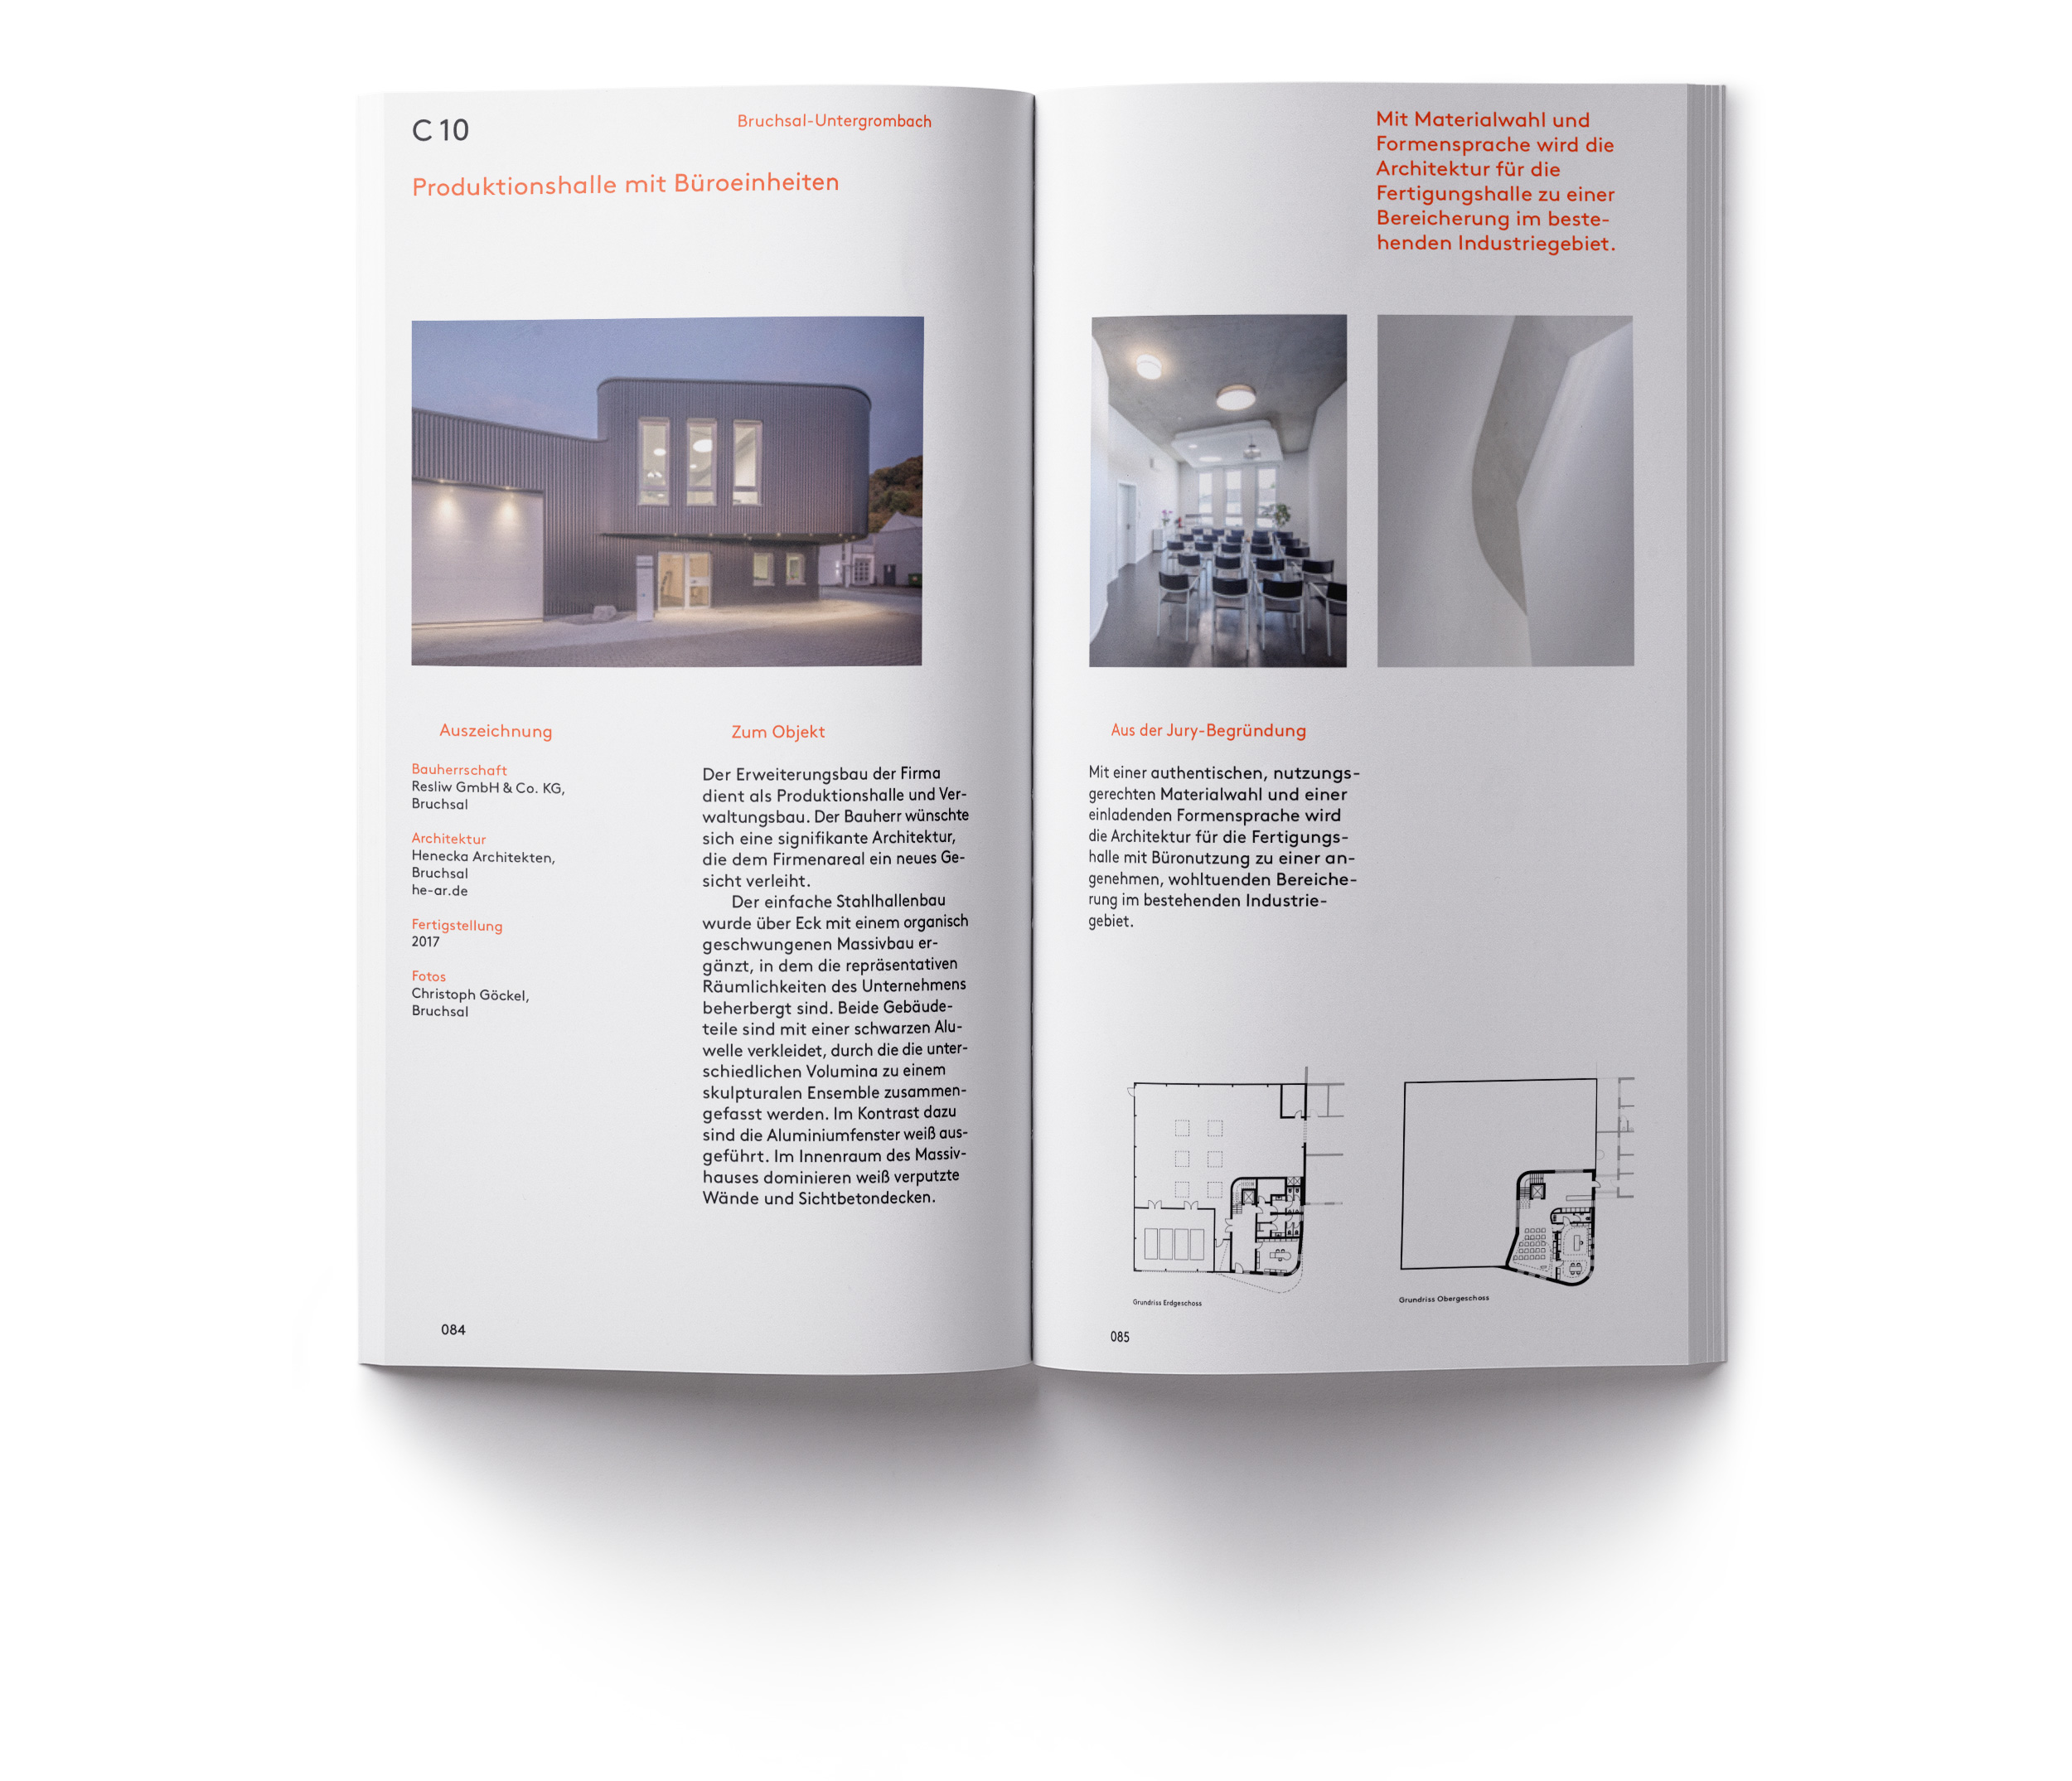 Architect magazin